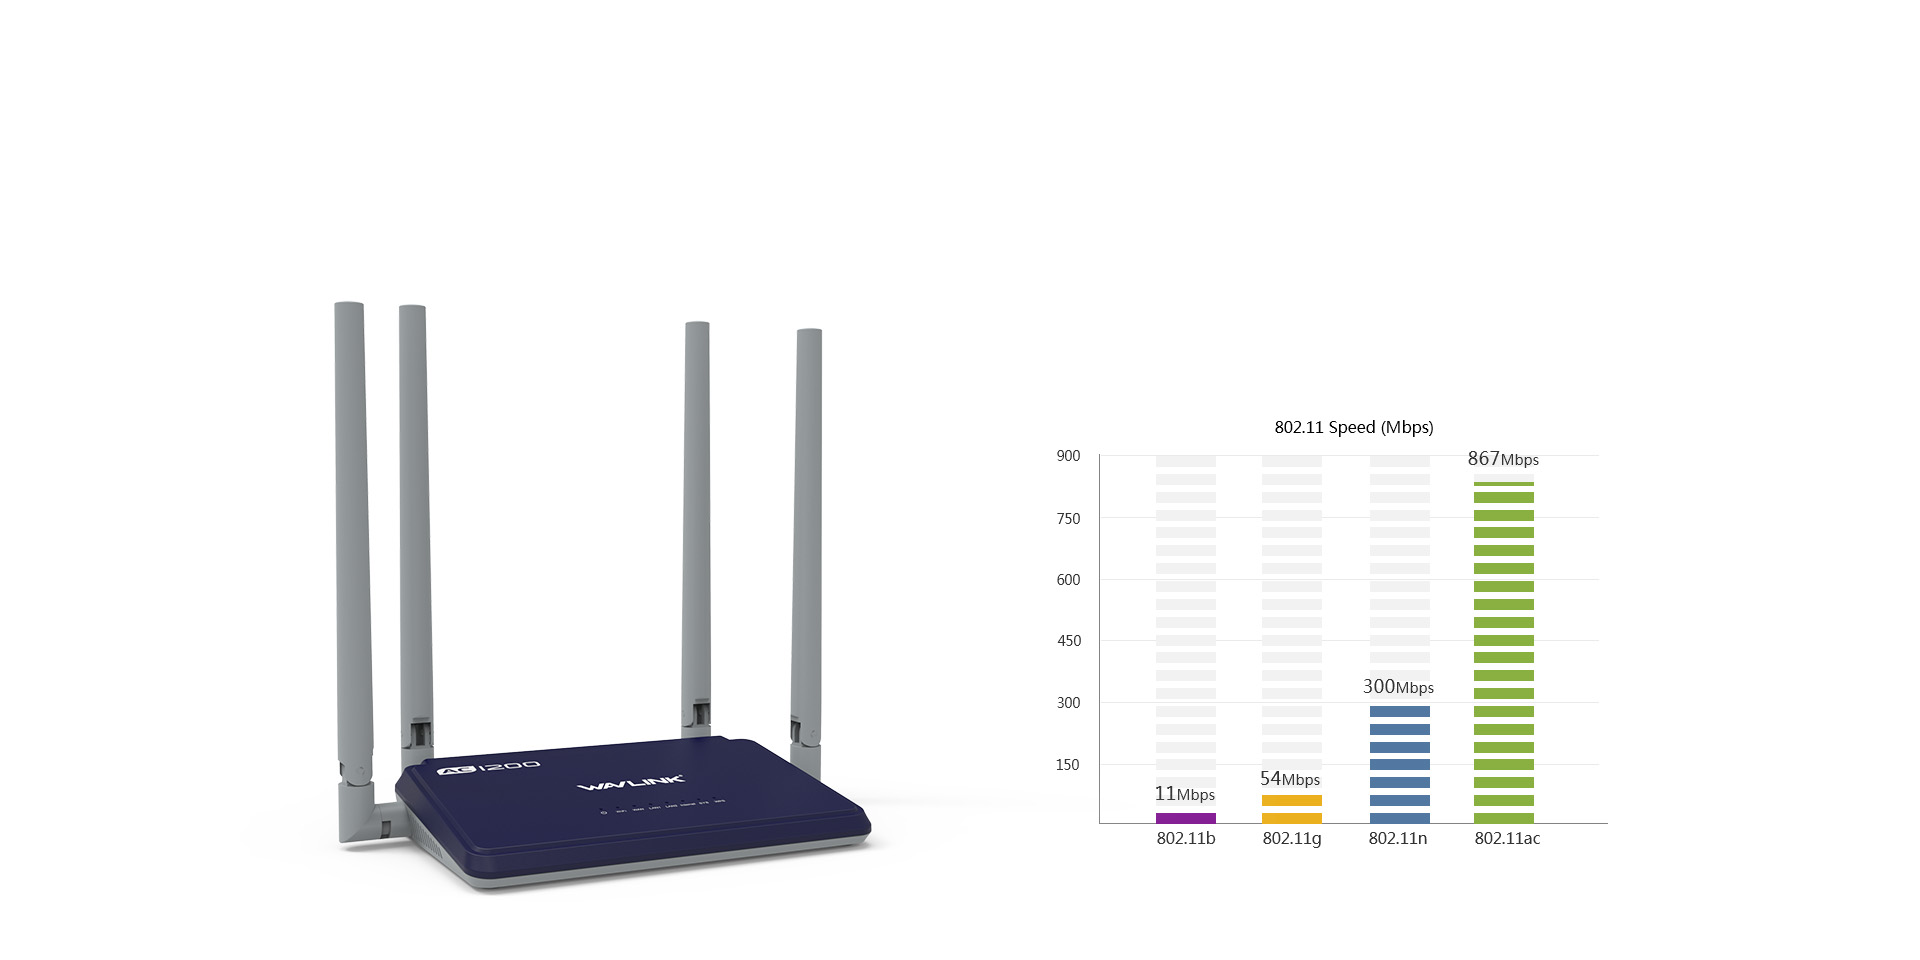 WL-WN529B3双频路由器,1200Mbps传输速率,高清影视、游戏无卡顿